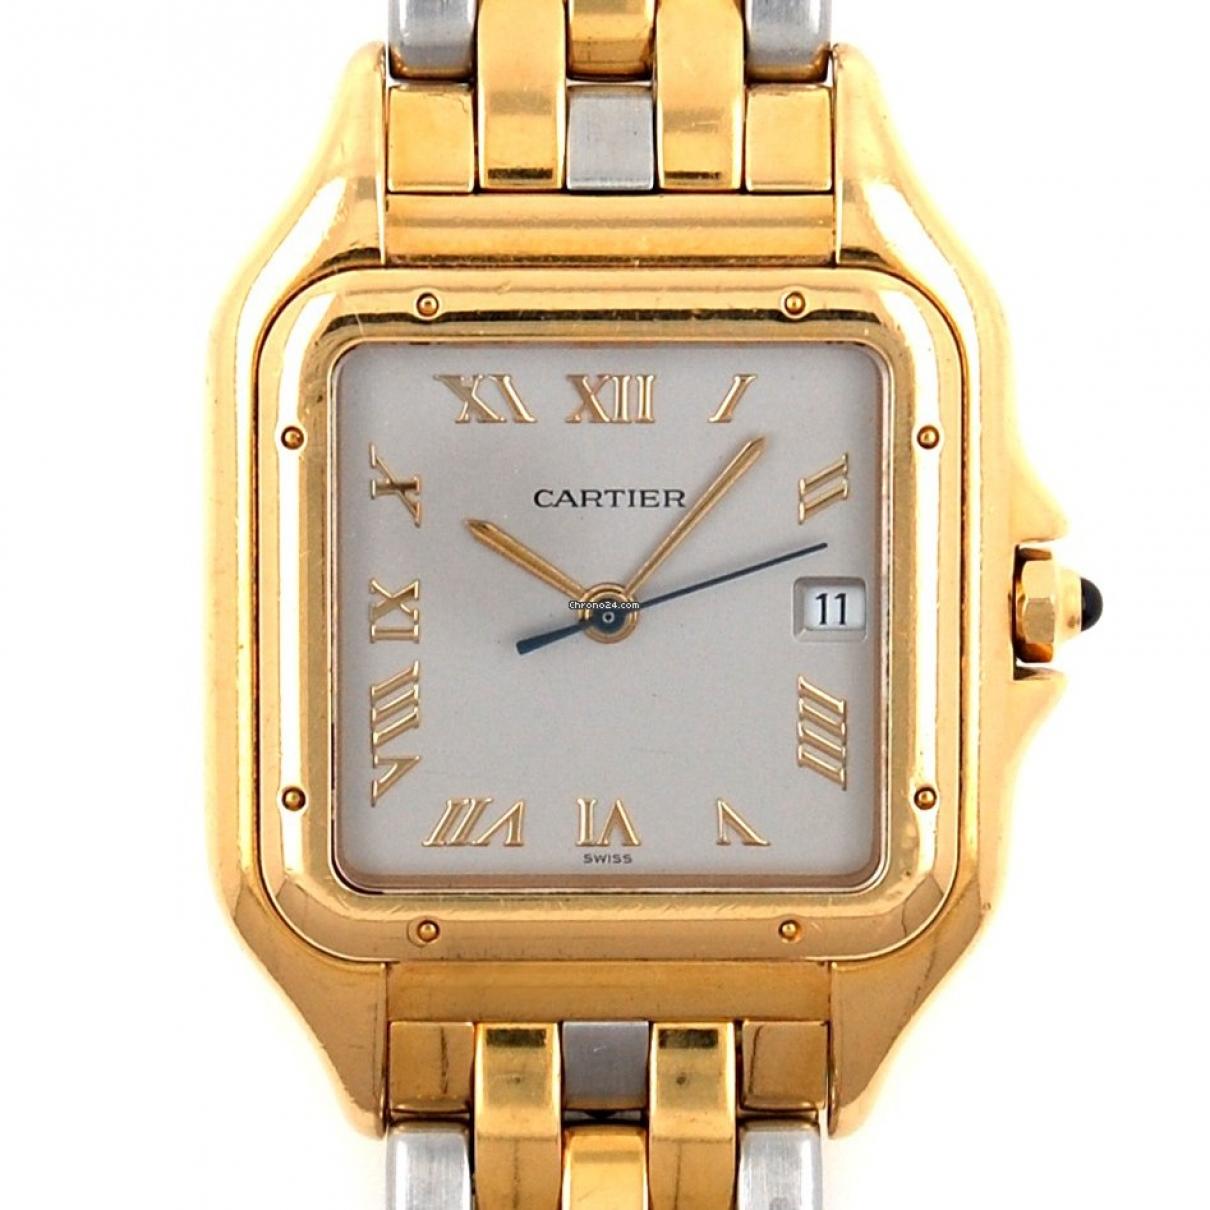 Cartier Panthere Uhr in  Gold Gold und Stahl